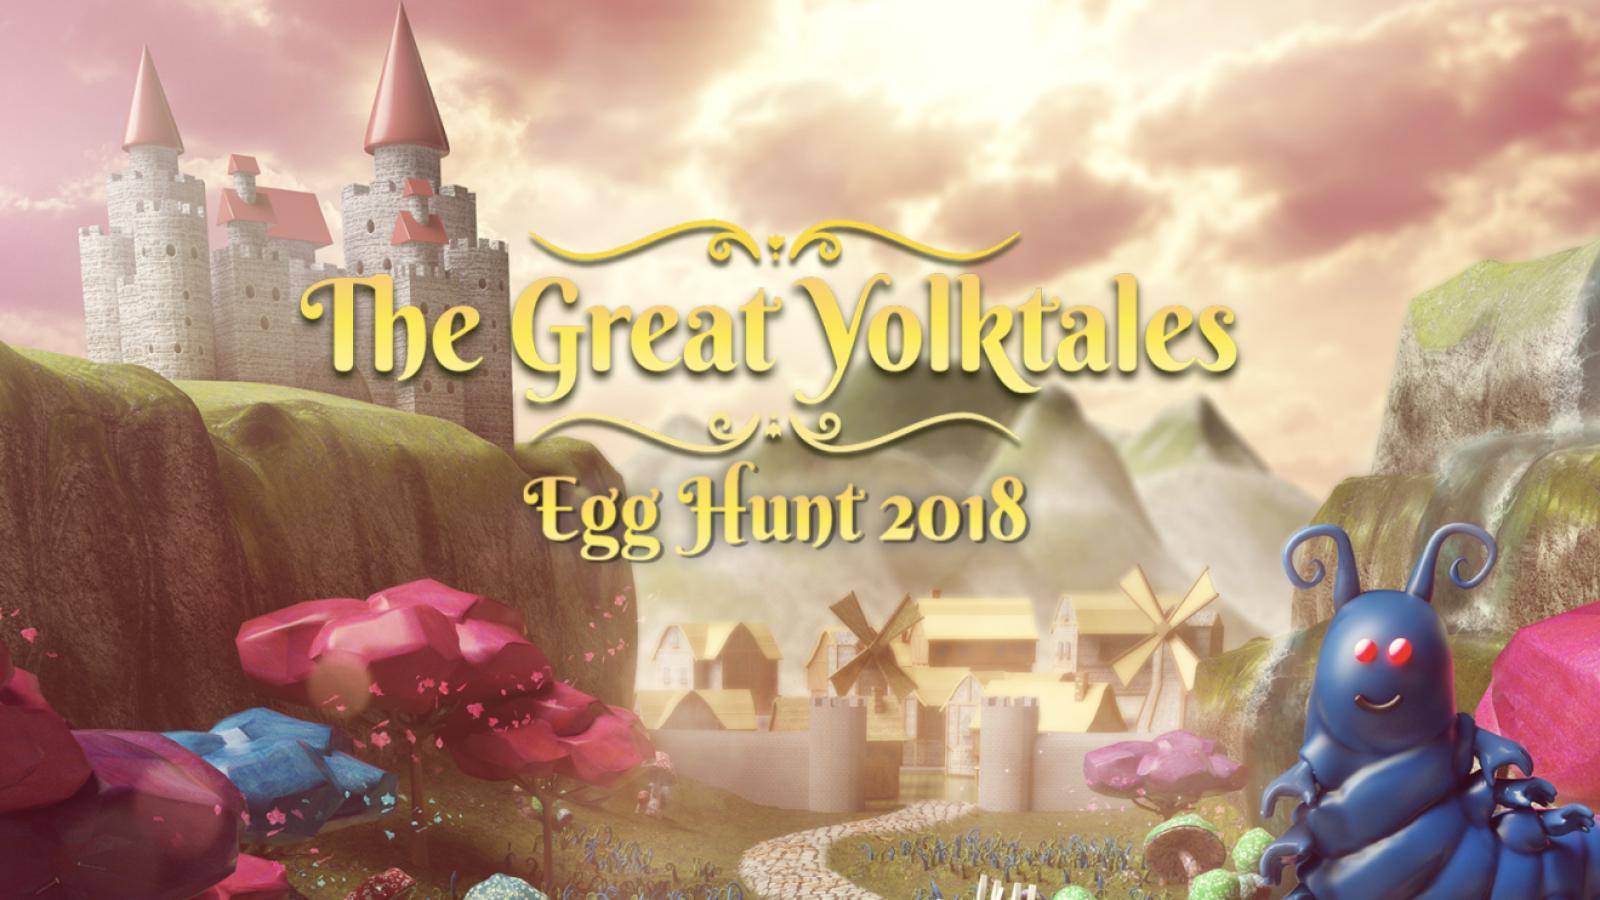 Egg Hunt 2018: The Great Yolktales [Official Trailer]